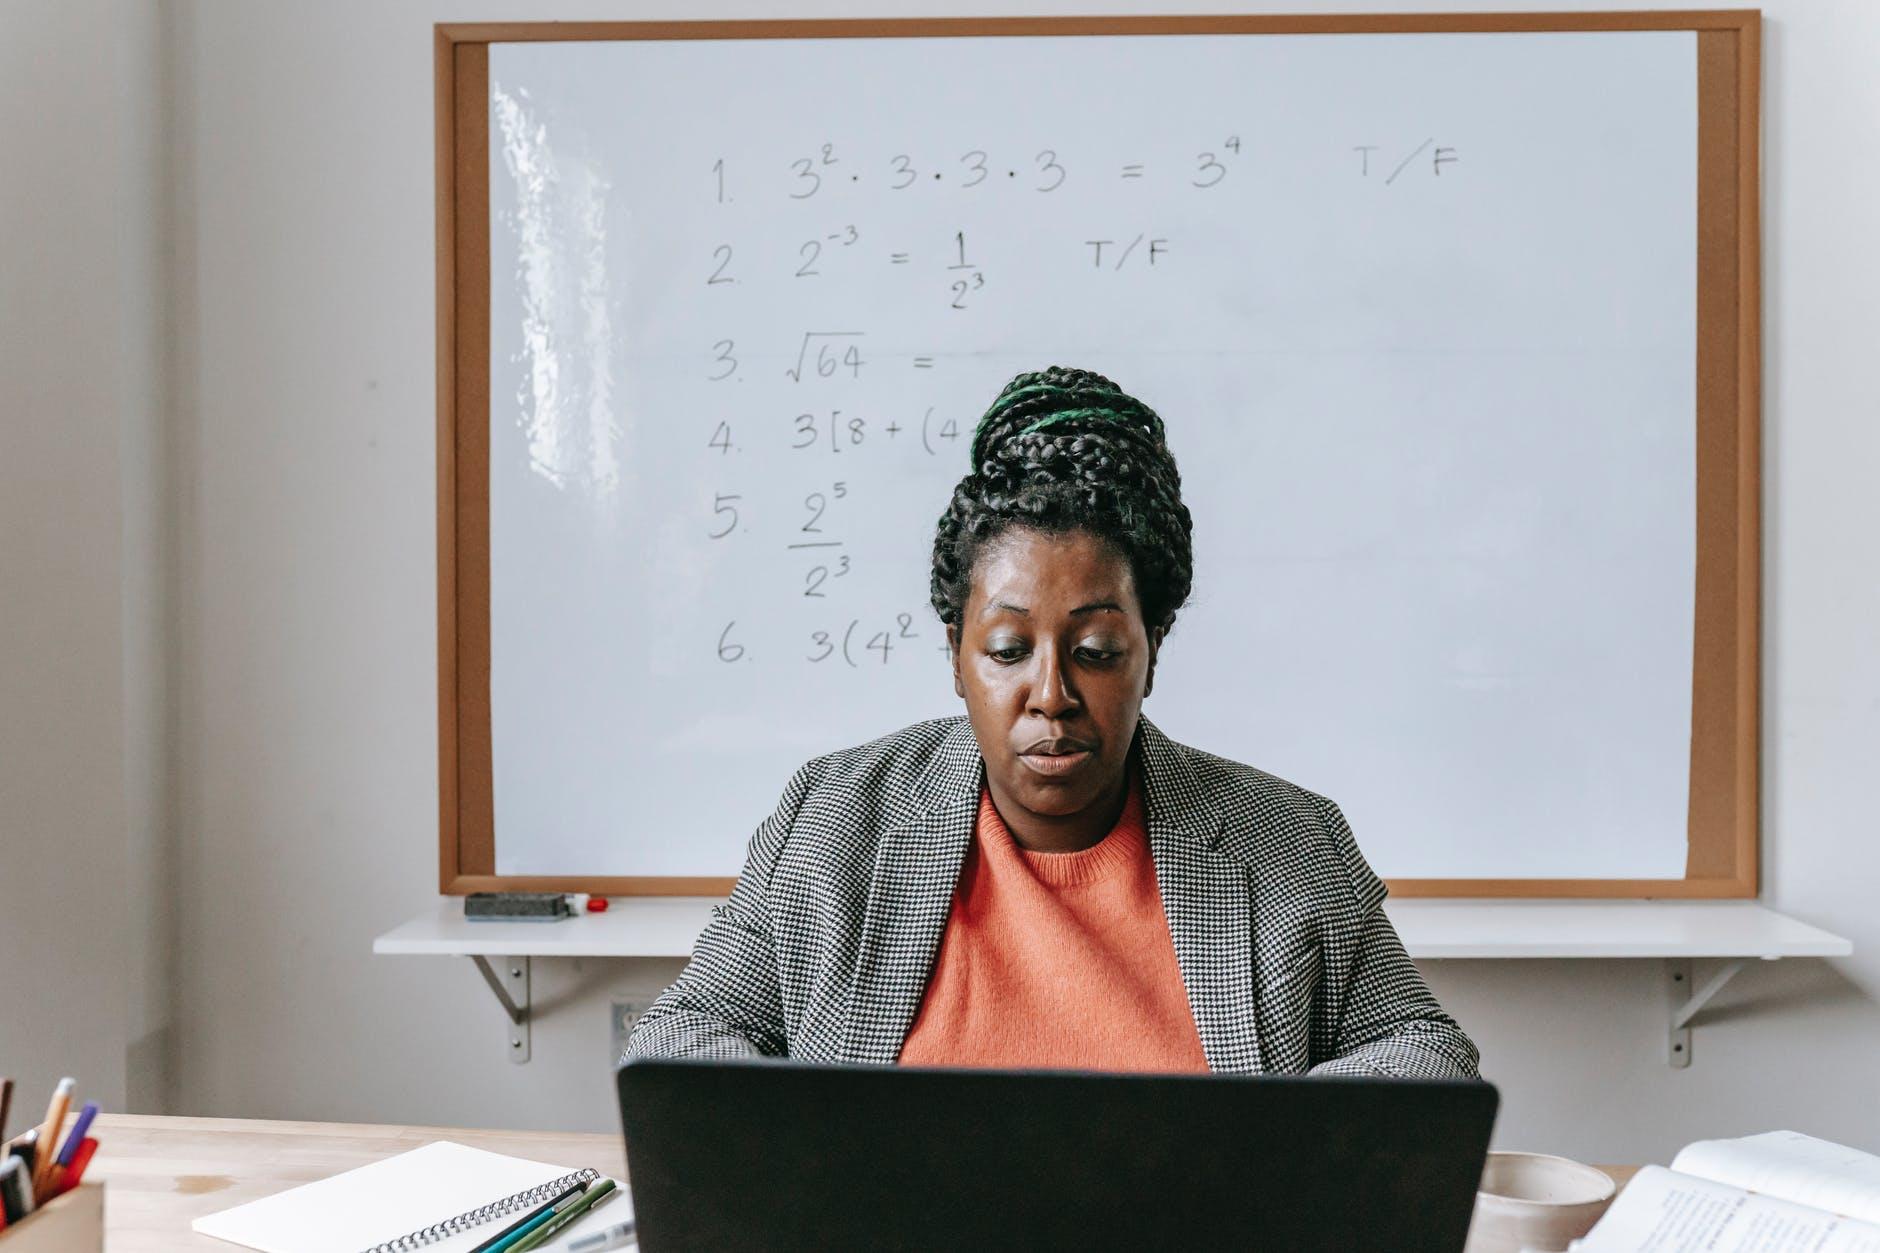 Black woman working on desk